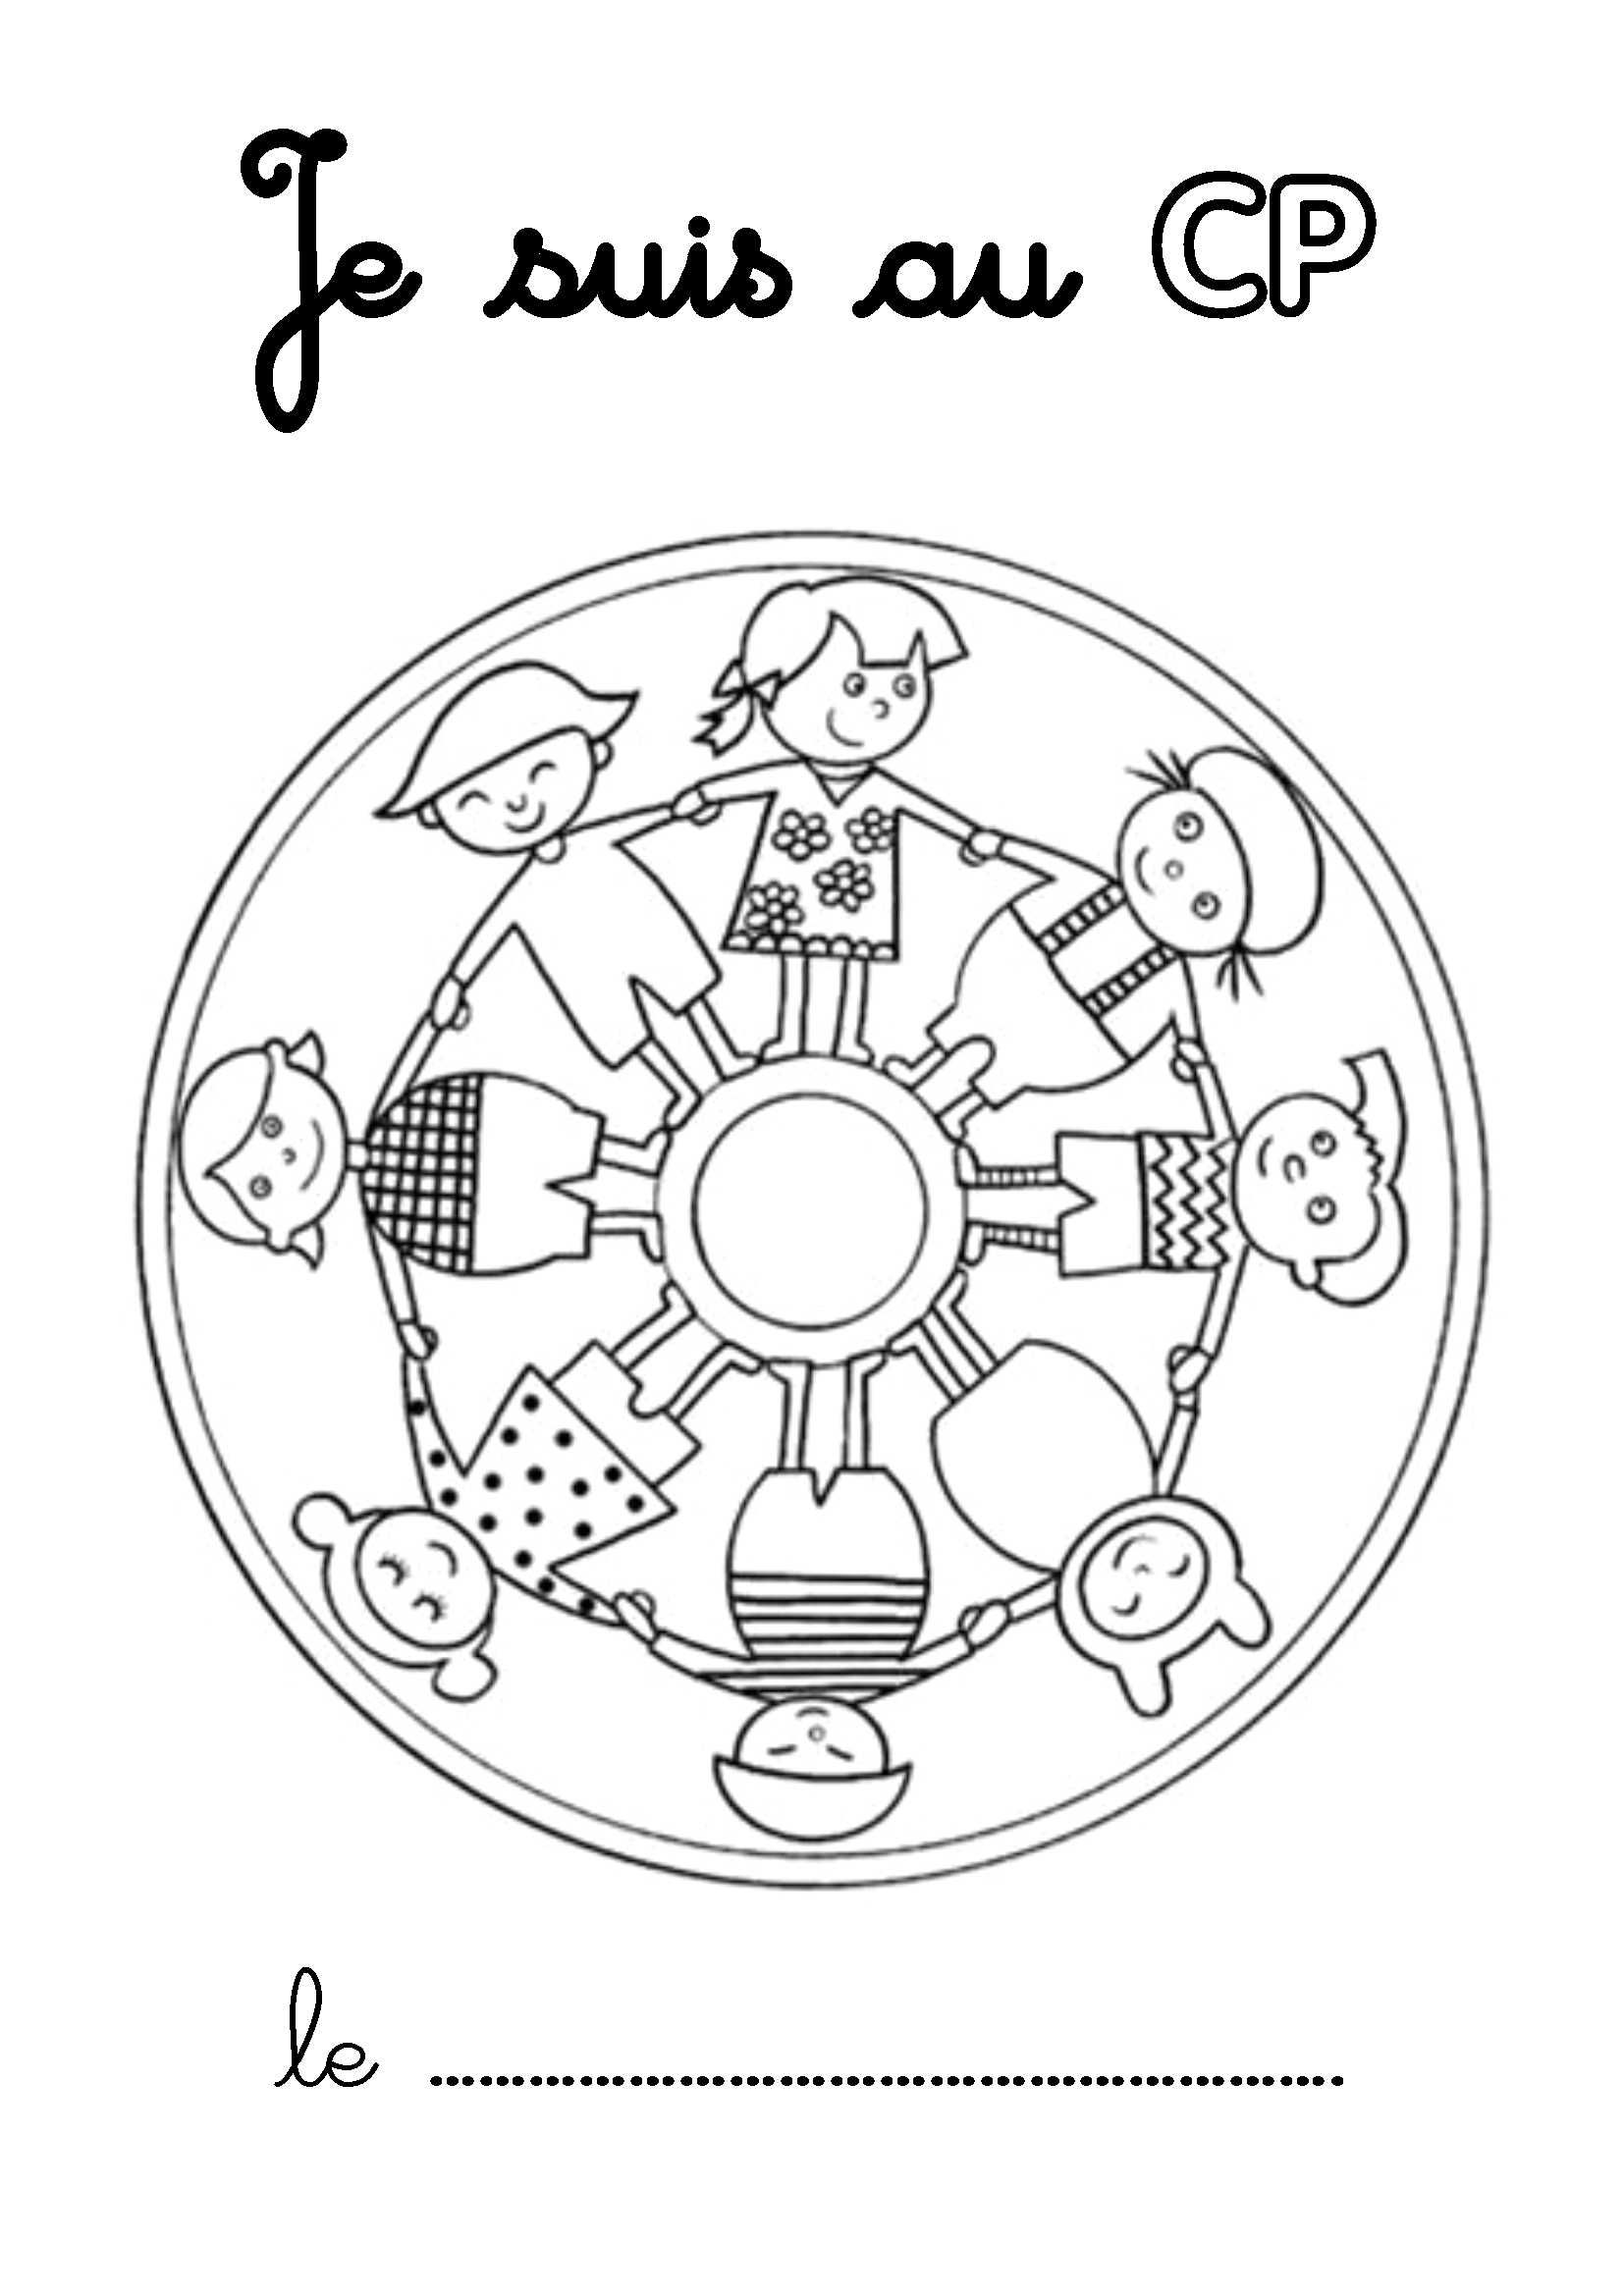 rentrée mandala - Recherche Google | Coloriage mandala